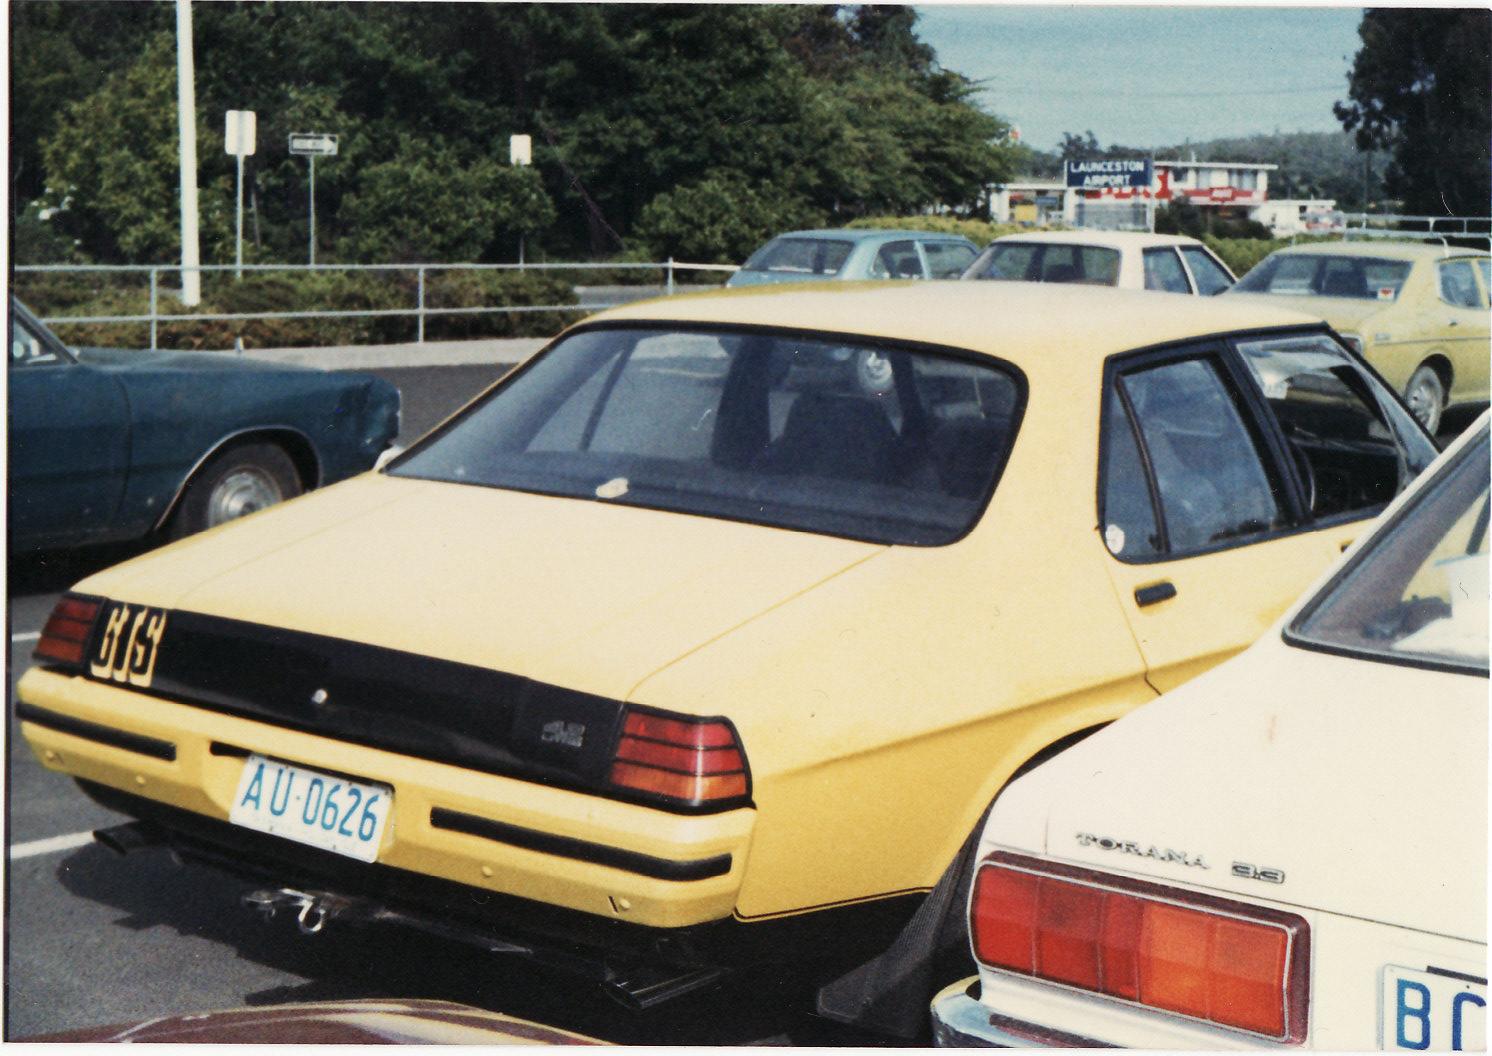 FileHolden HX Monaro GTS 4-door c. 1975-76 (Australia & File:Holden HX Monaro GTS 4-door c. 1975-76 (Australia) (16787677705 ...